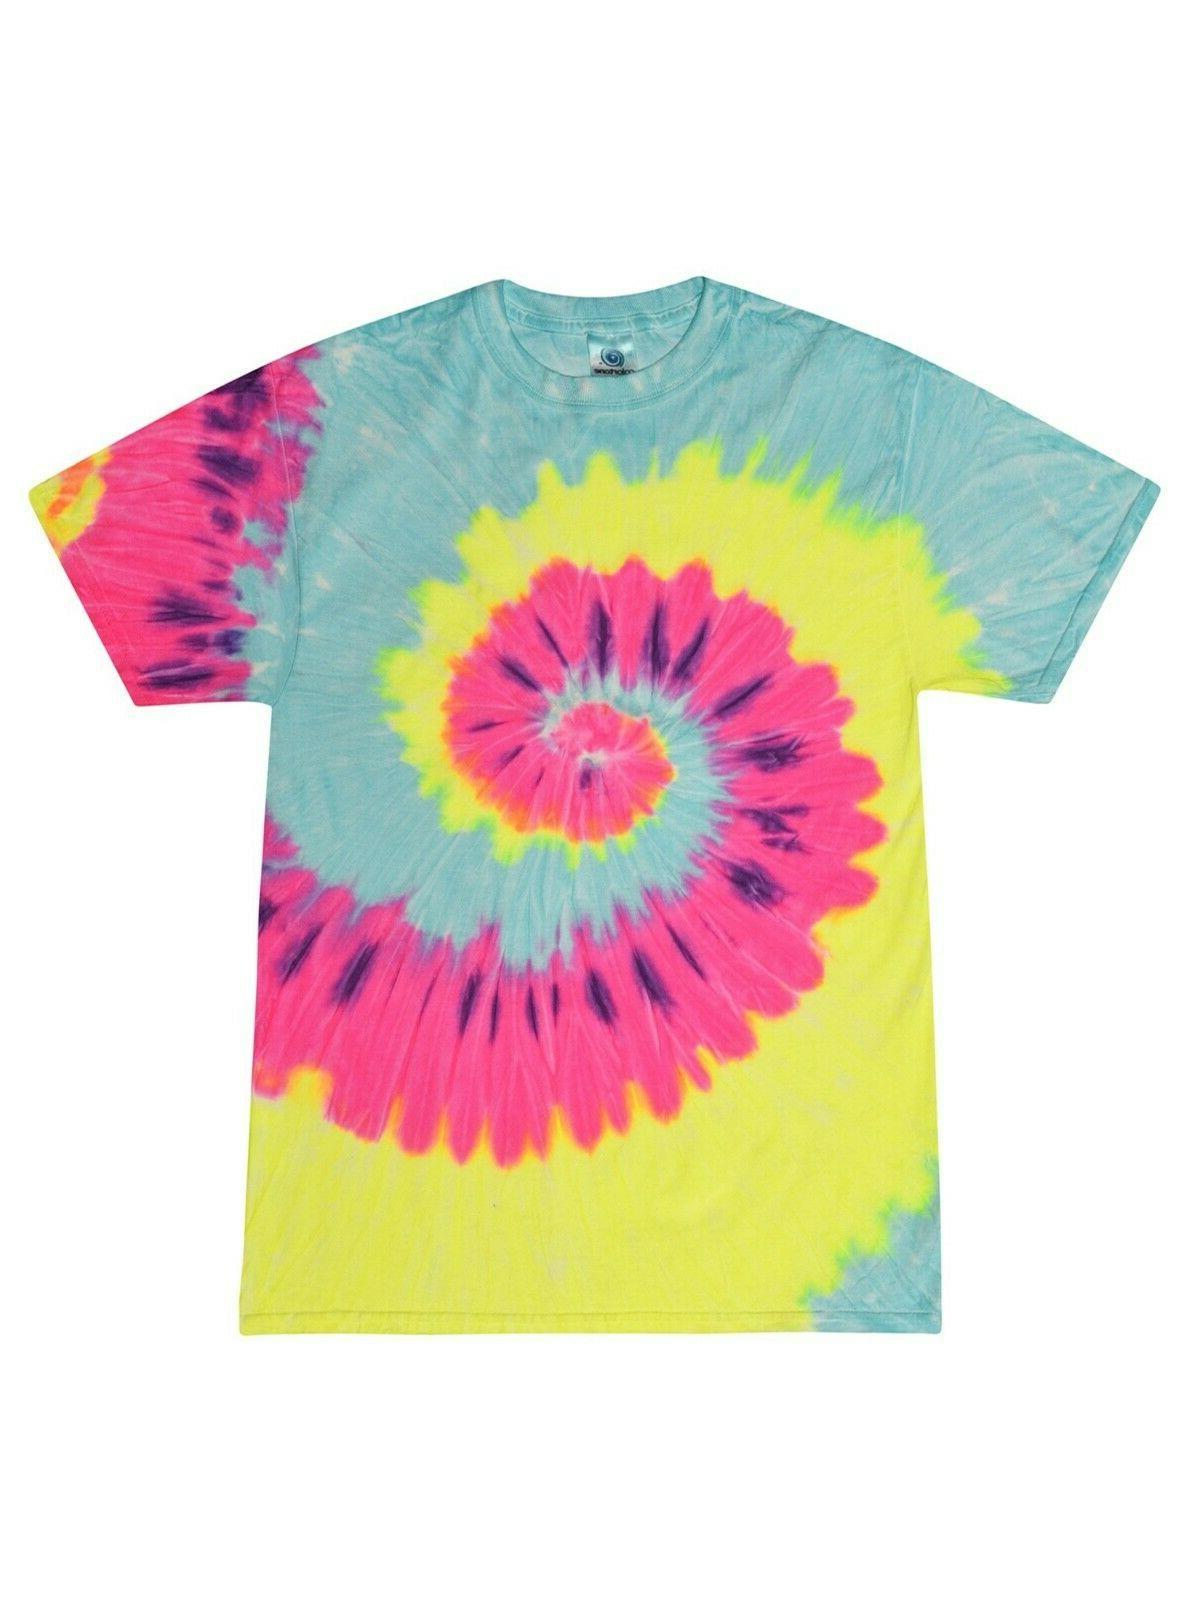 Vibrant T-Shirts Adult SM XXXXXL 100% Cotton